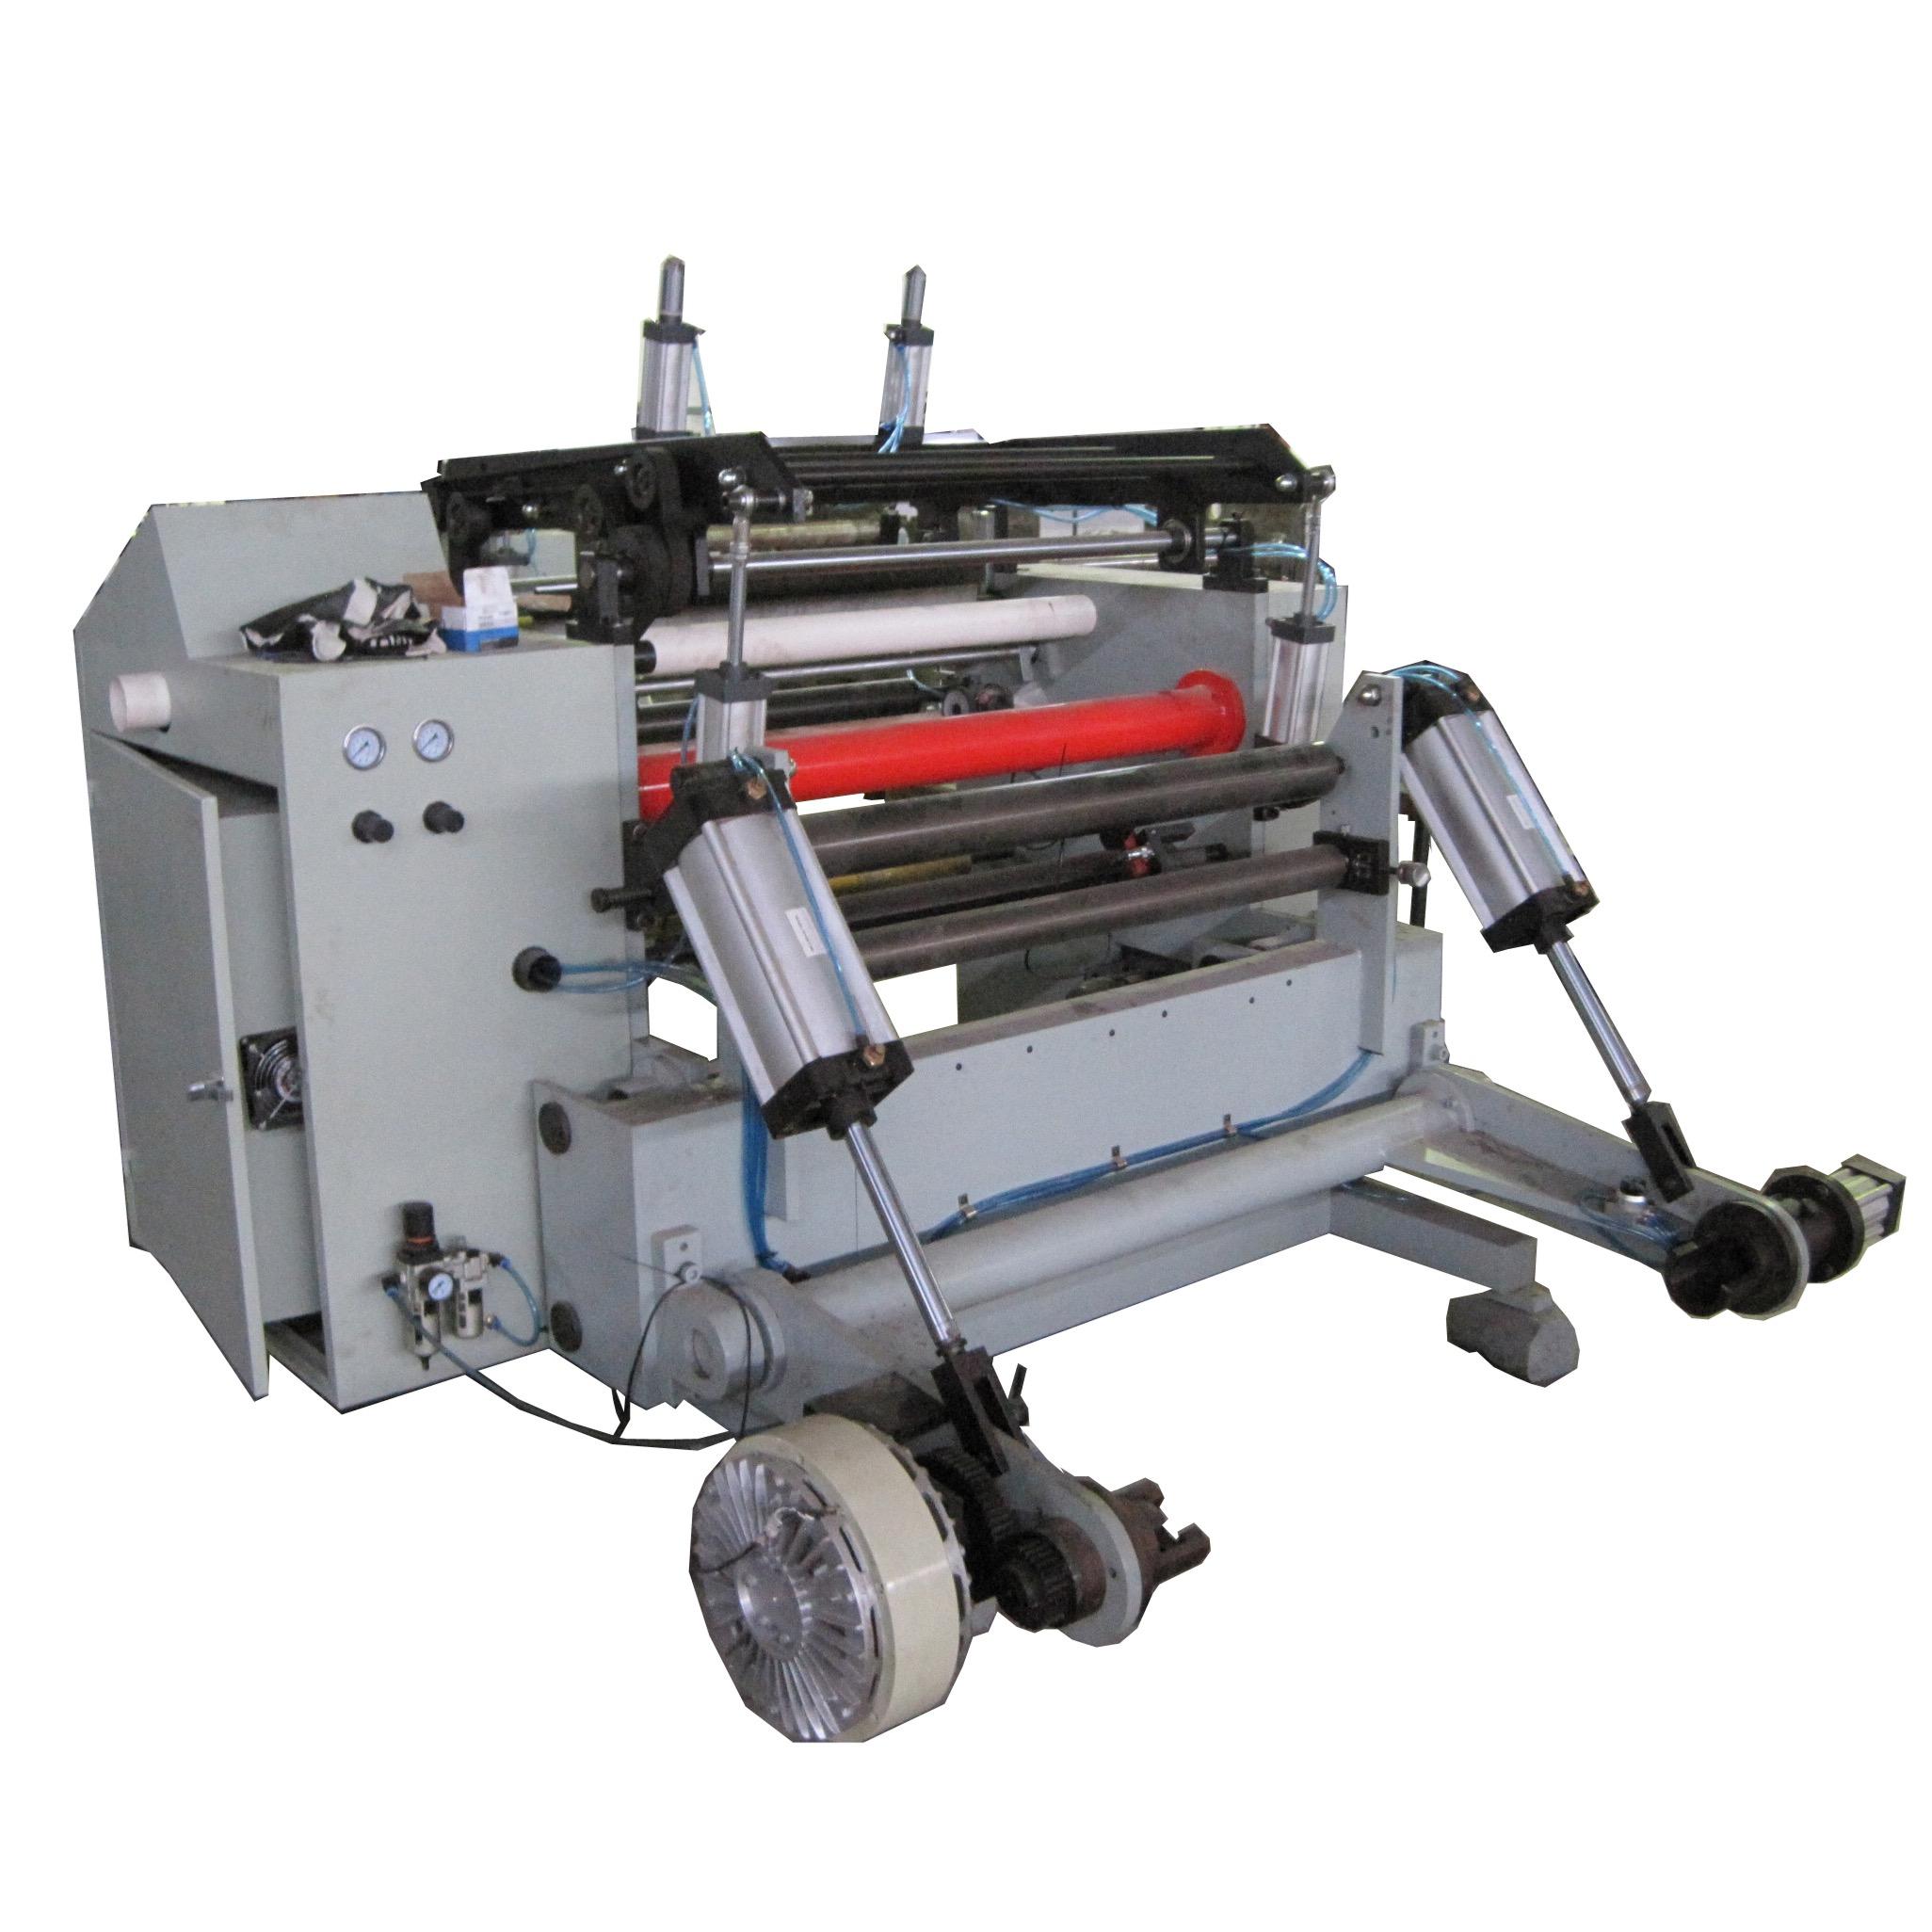 FW 380-450V תרמית נייר רול אלומיניום גיליון שיסוף מכונה אחורה יצרנים חשמלי שיסוף מכונה אחורה